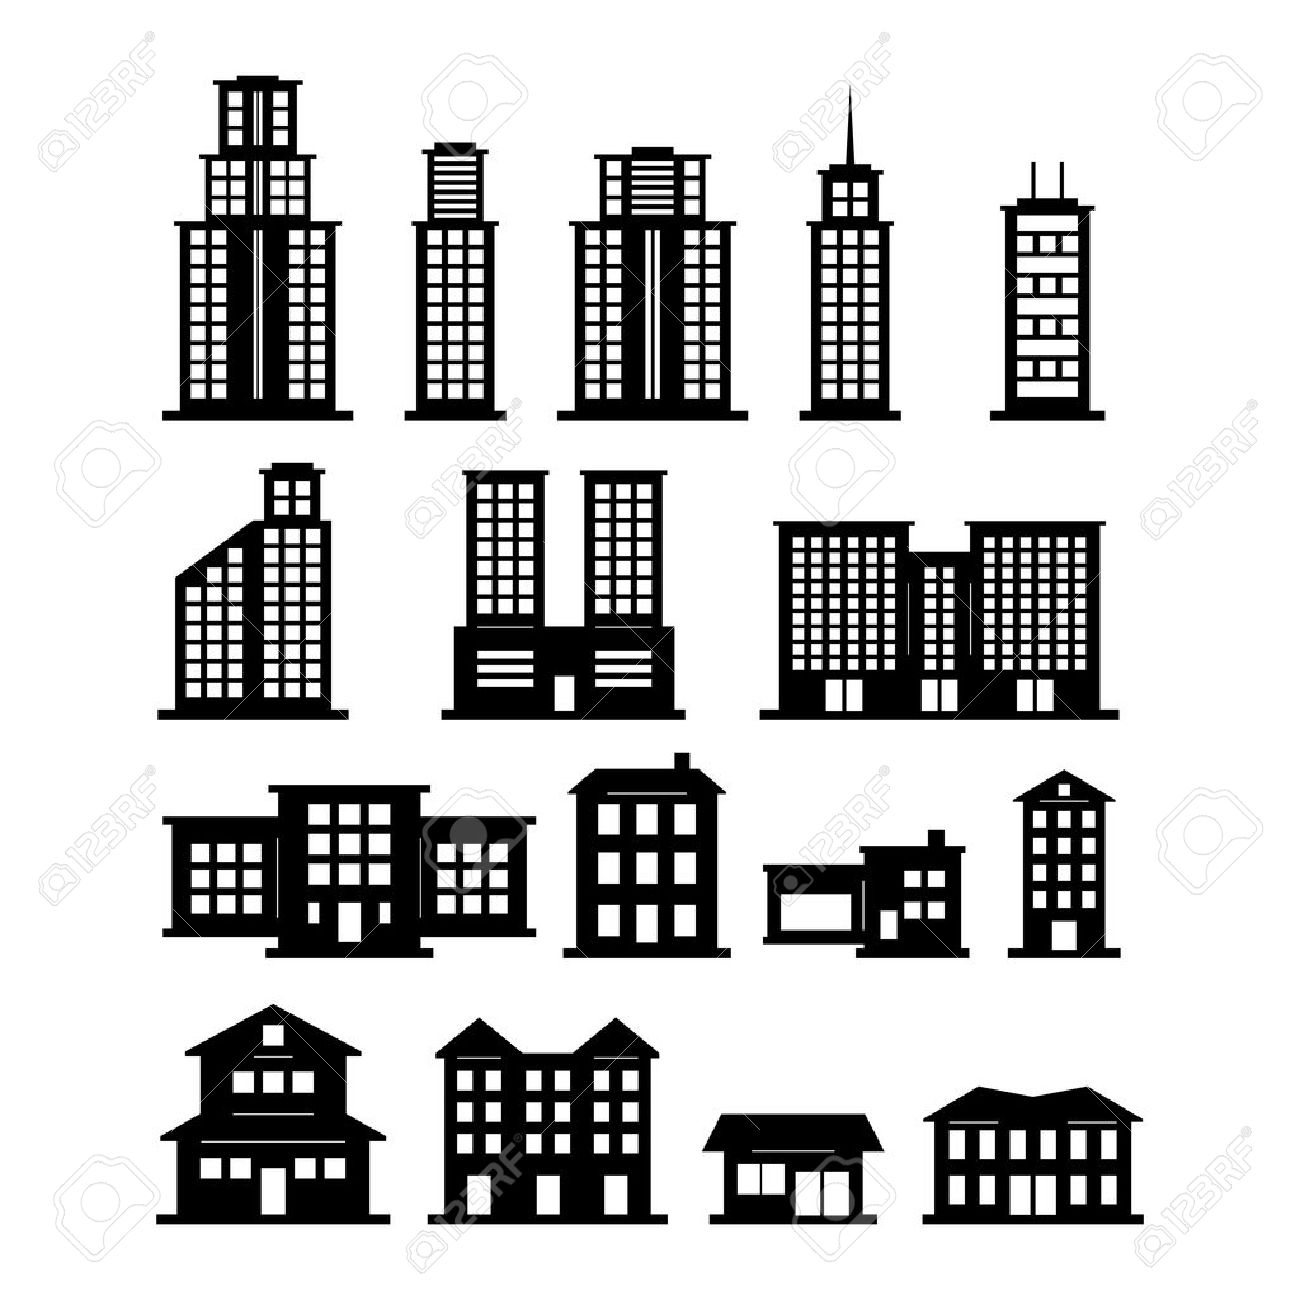 building vector royalty free cliparts vectors and stock rh 123rf com vector building arma 3 vector building services